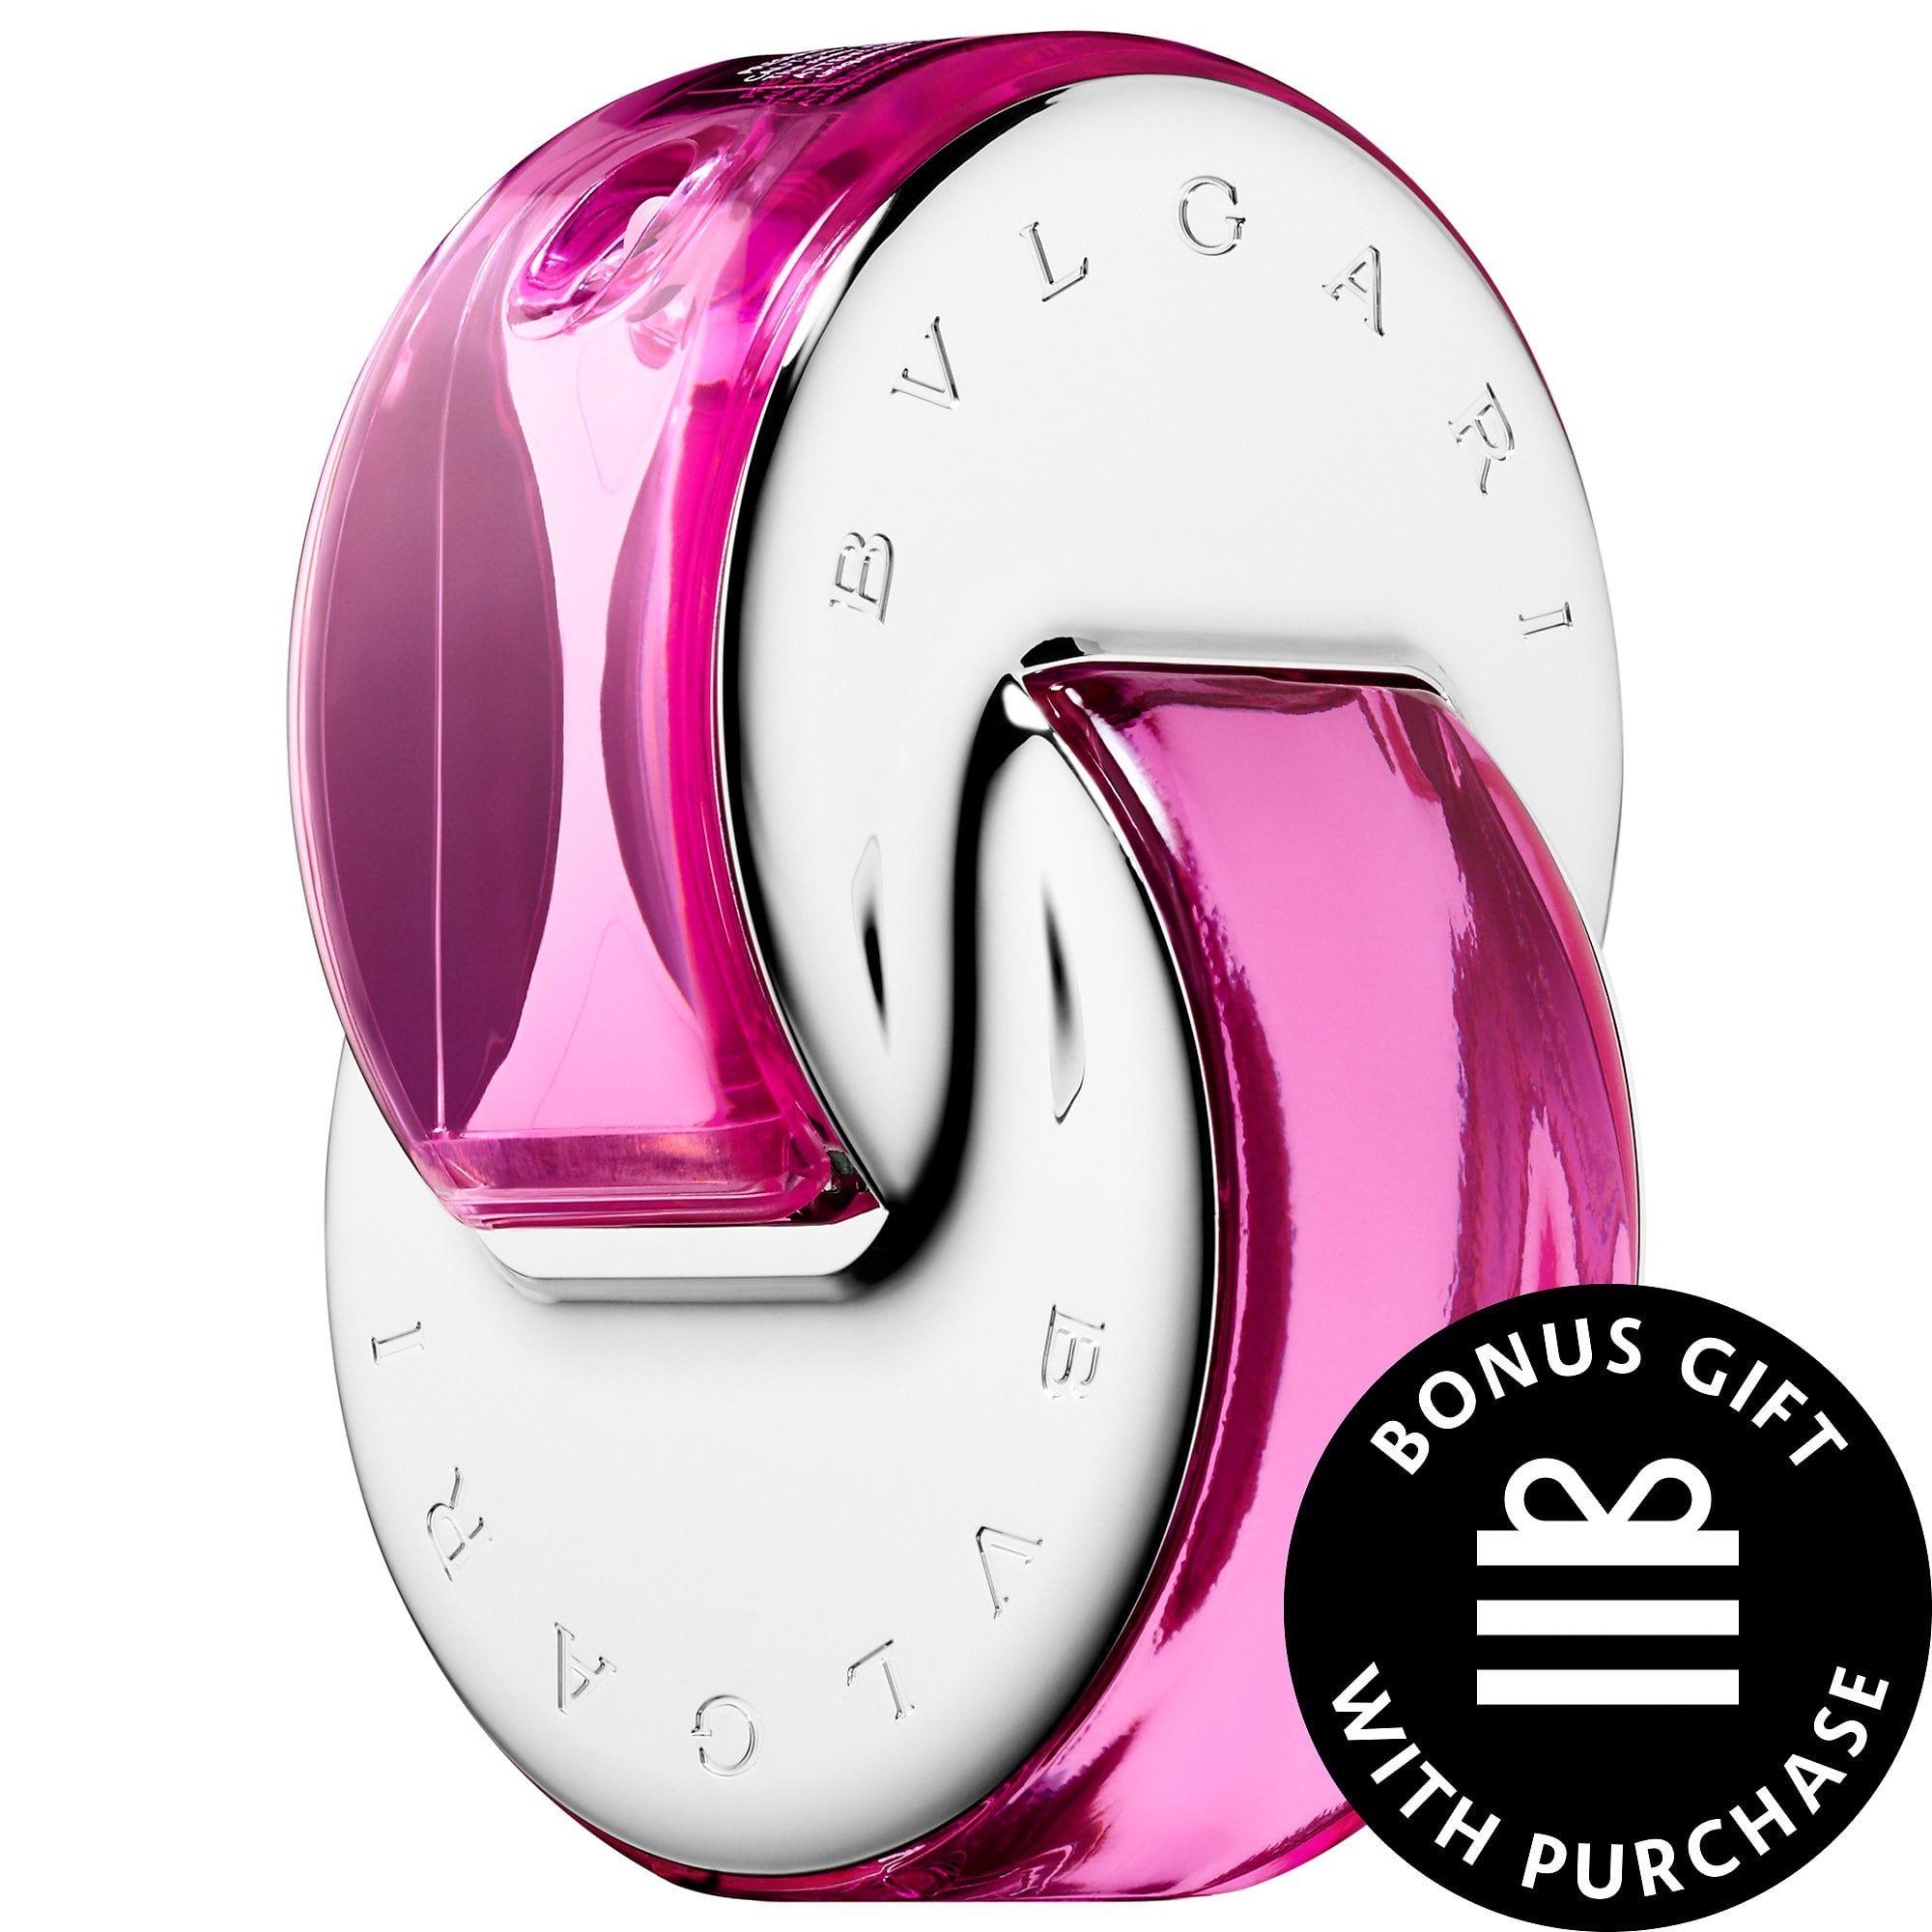 Bvlgari Omnia Pink Sapphire Eau De Toilette Spray 1 3 Oz Fragrance Bvlgari Eau De Toilette